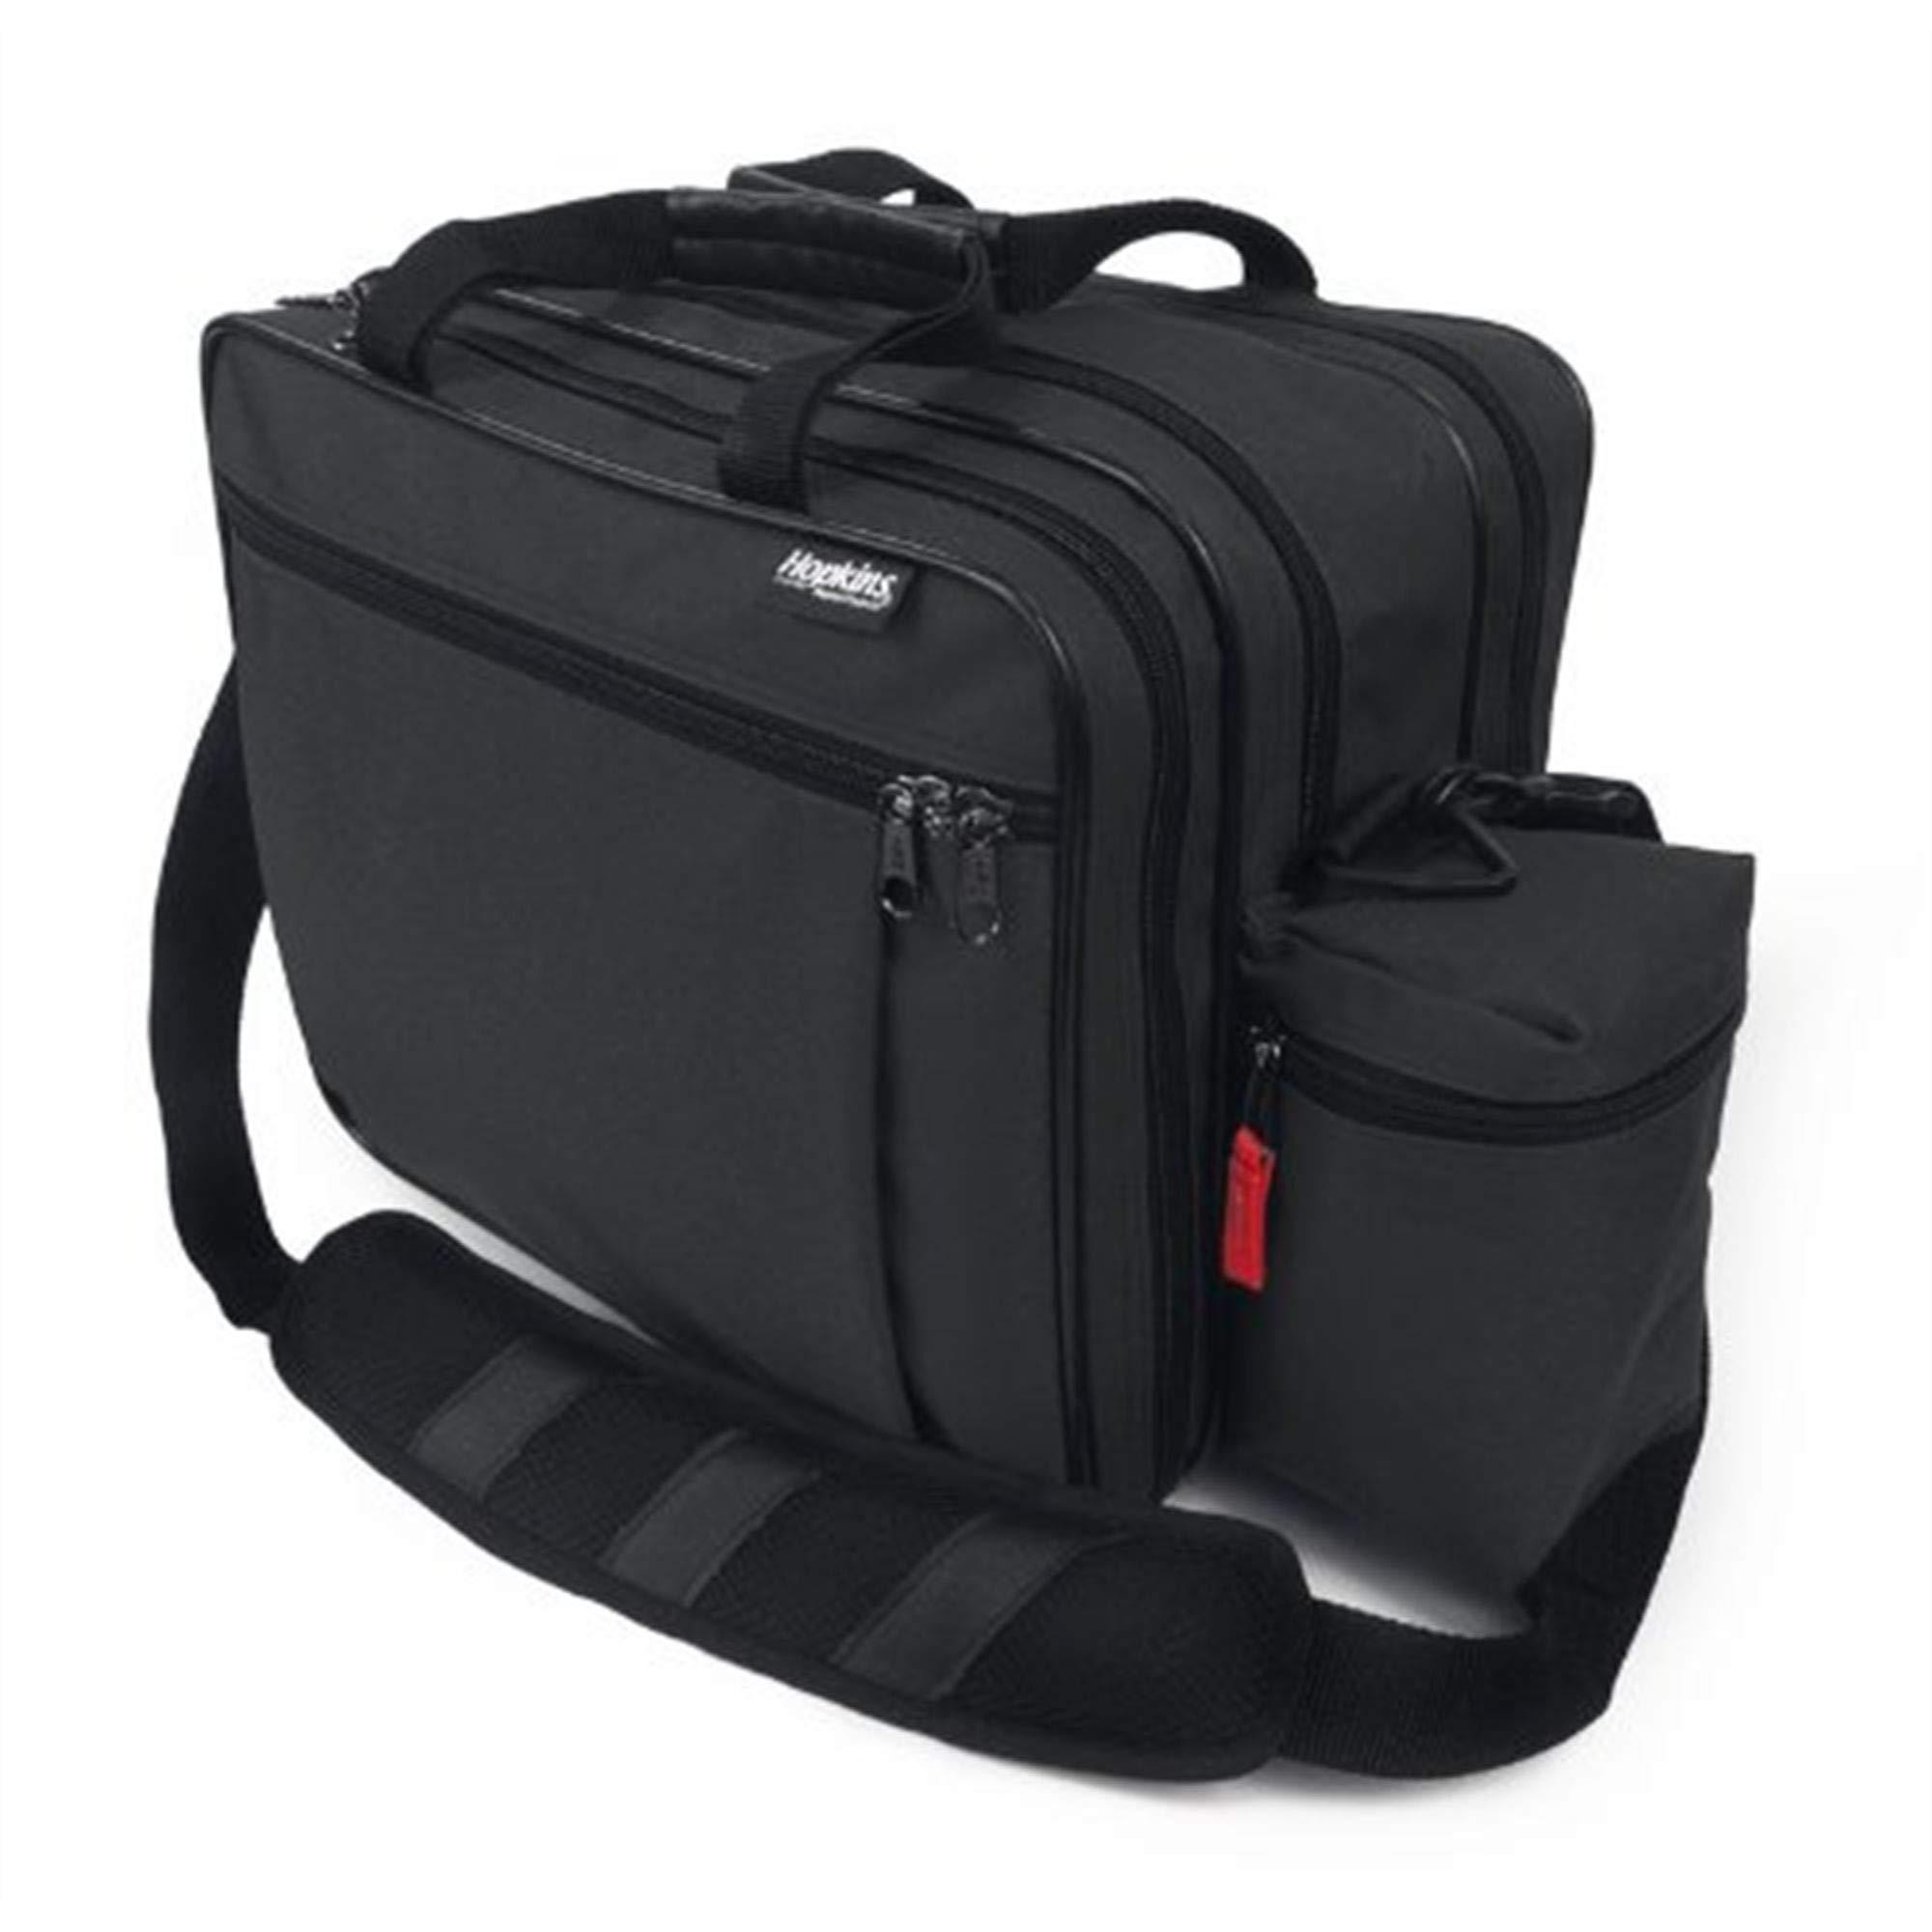 Hopkins Medical Products EZ View Medical Bag -  Black by Hopkins Medical Products